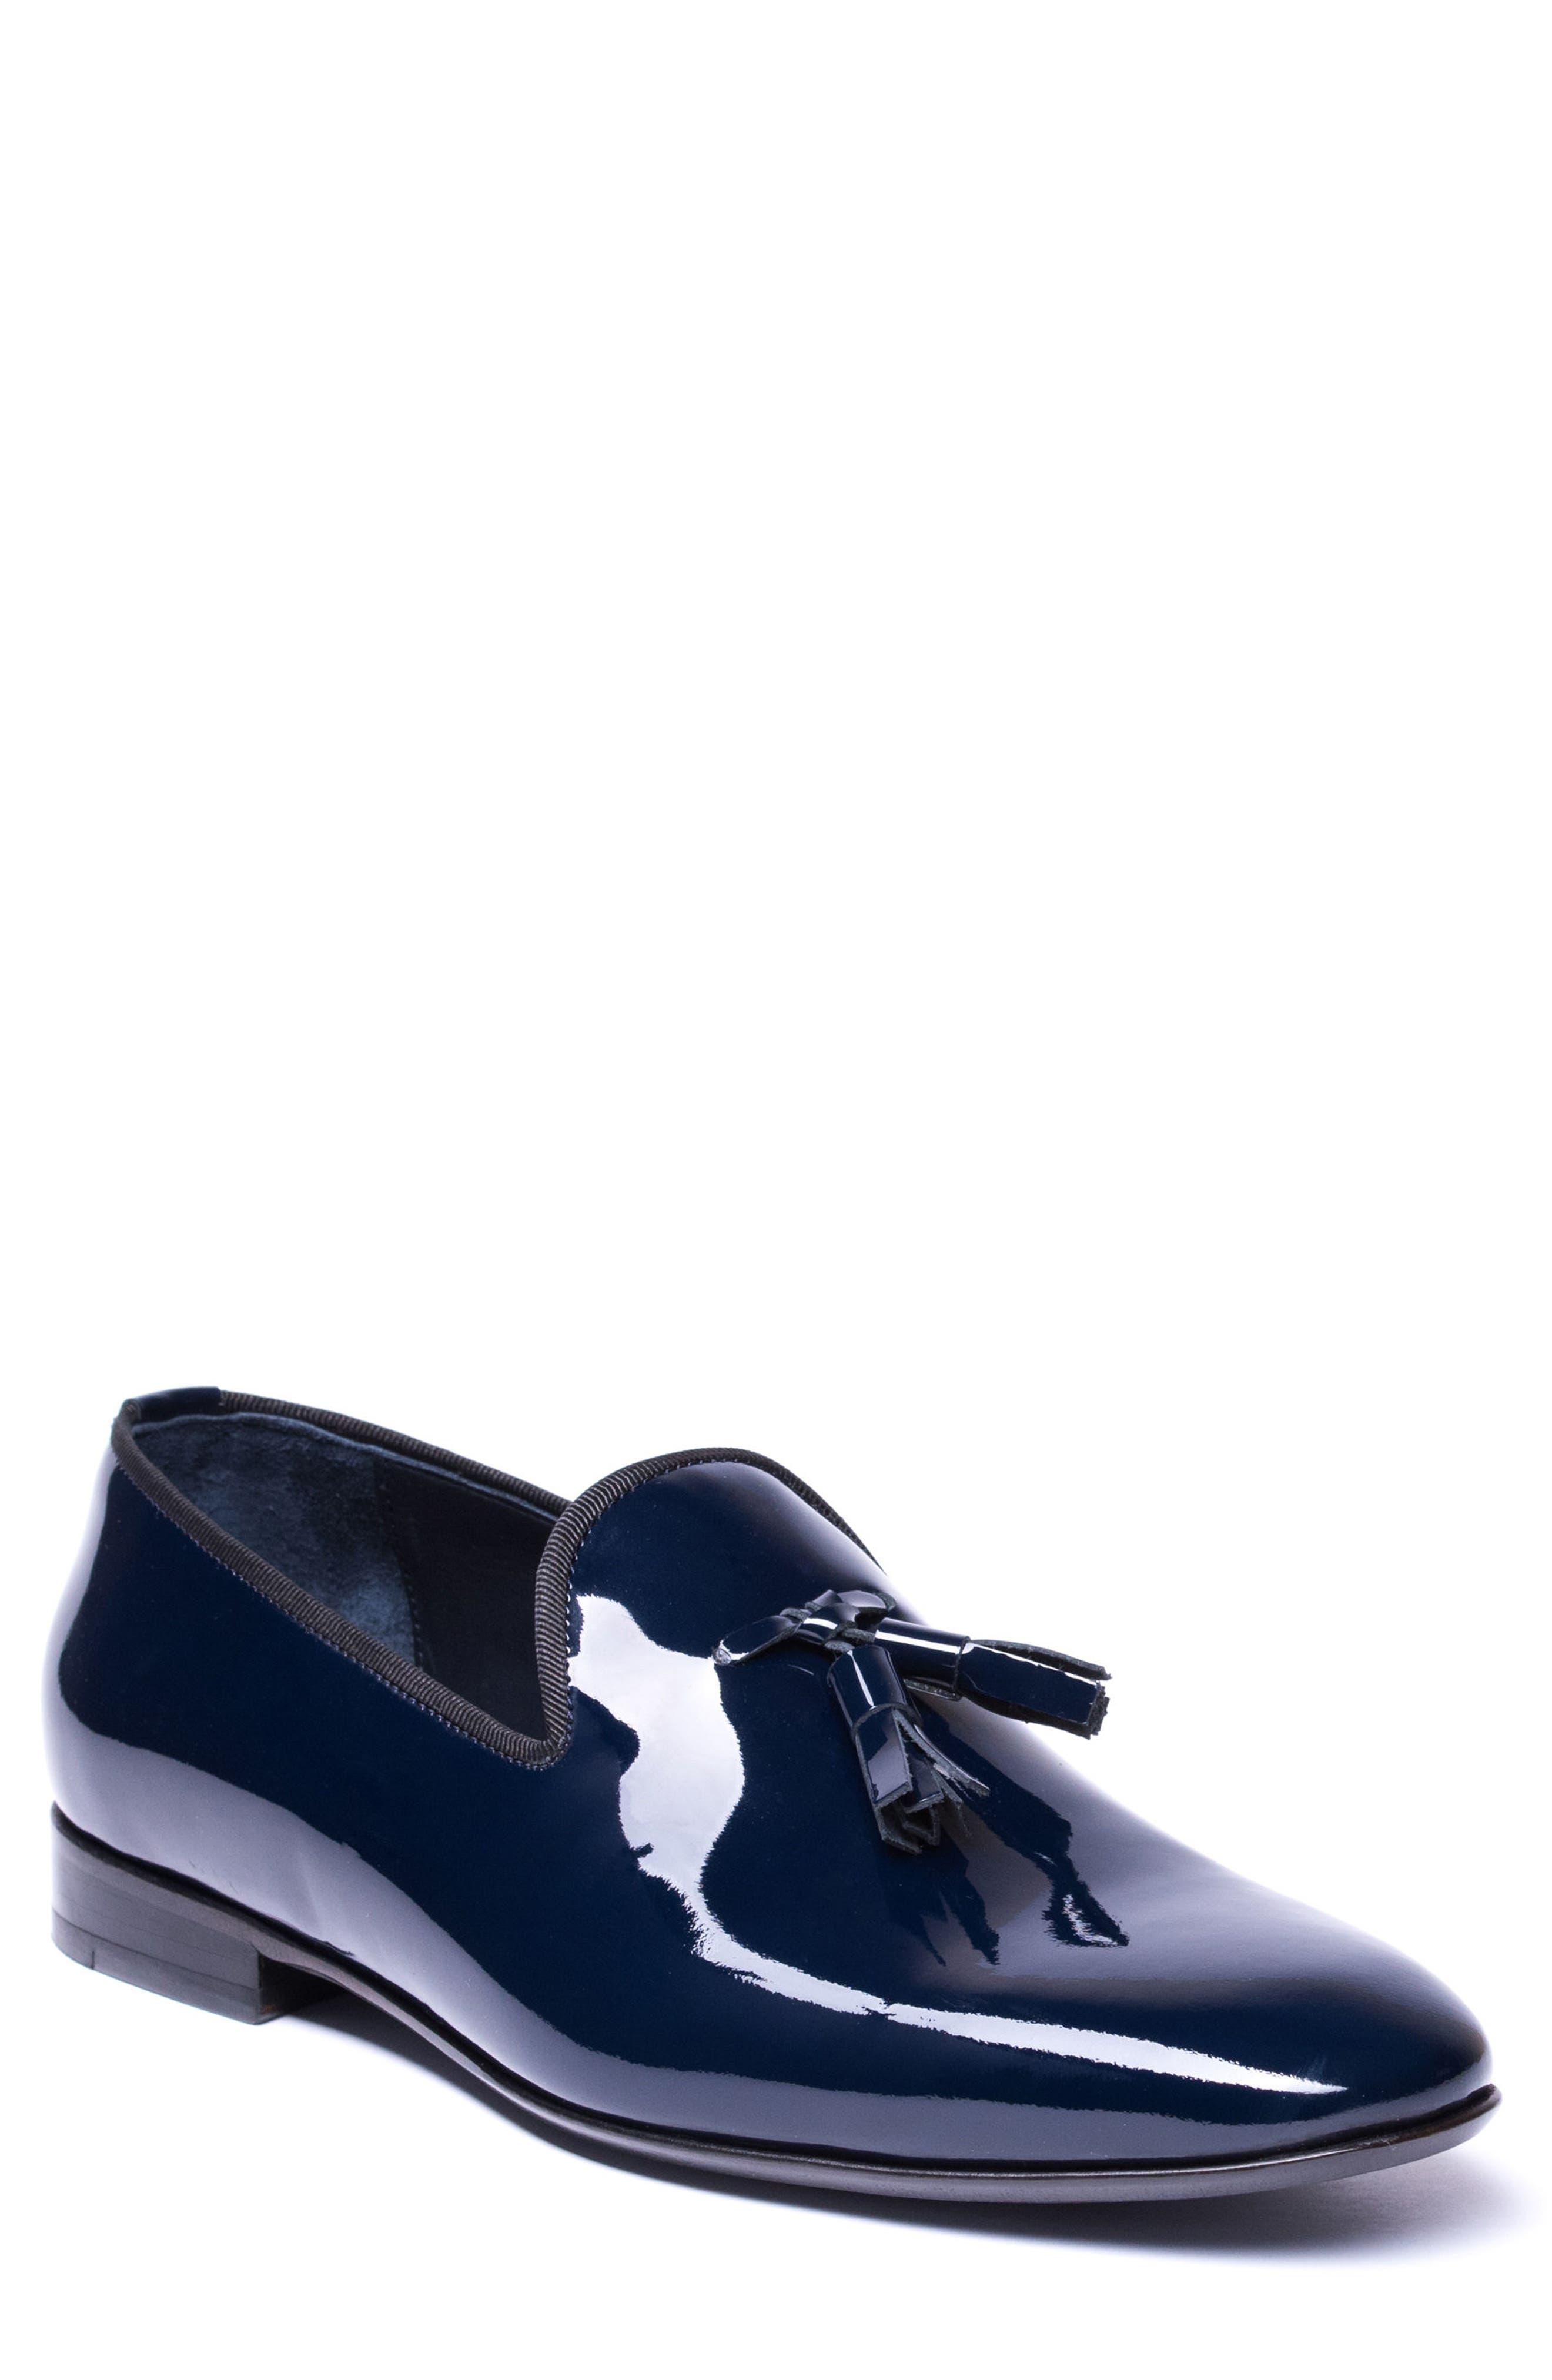 Enzo Tasseled Venetian Loafer,                             Main thumbnail 1, color,                             Navy Leather